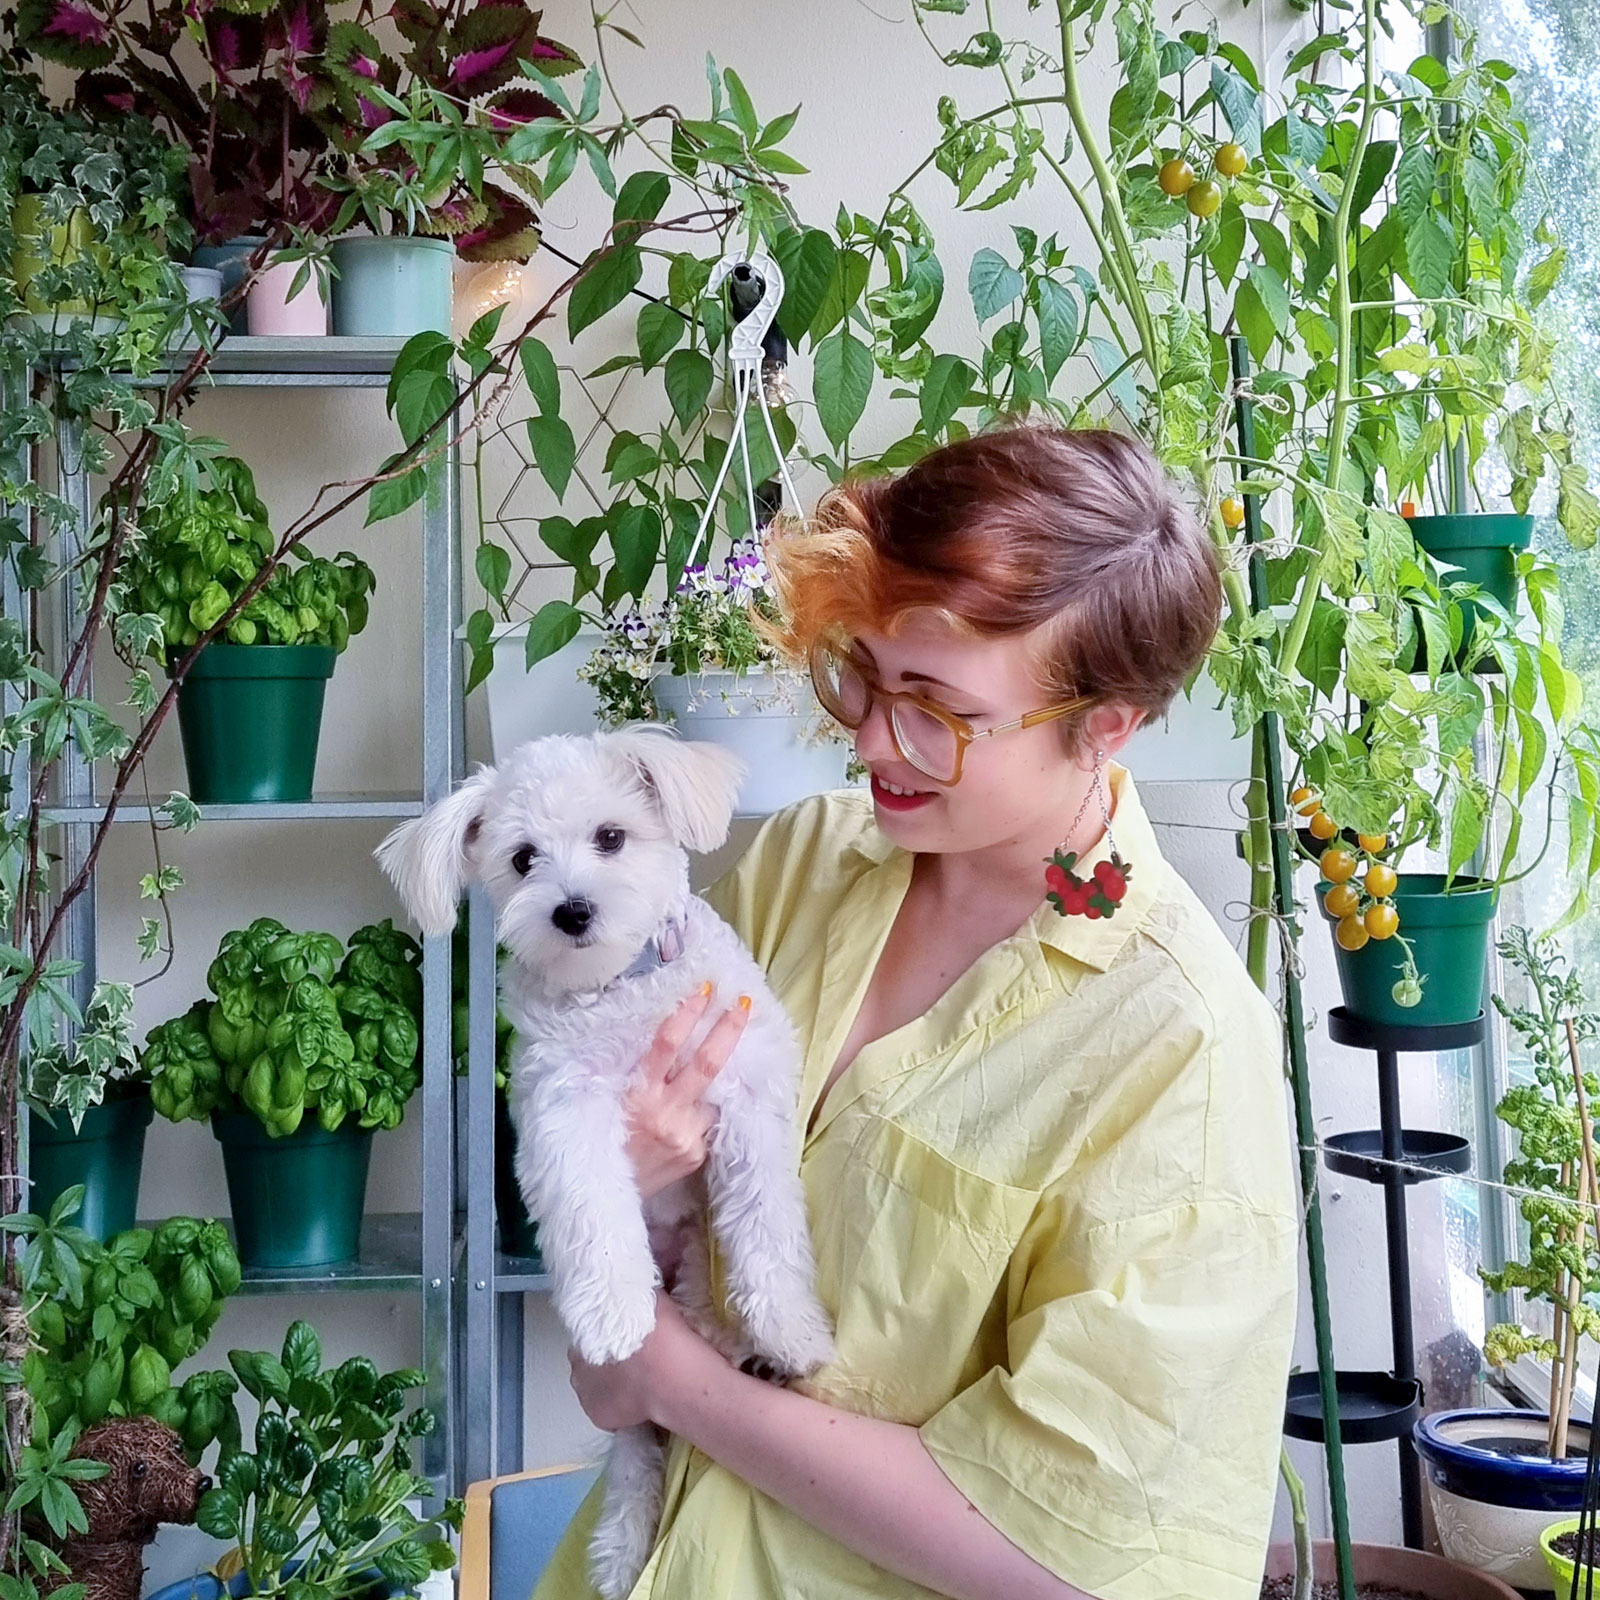 Kira Vesikko and their puppy, Pumpuli.